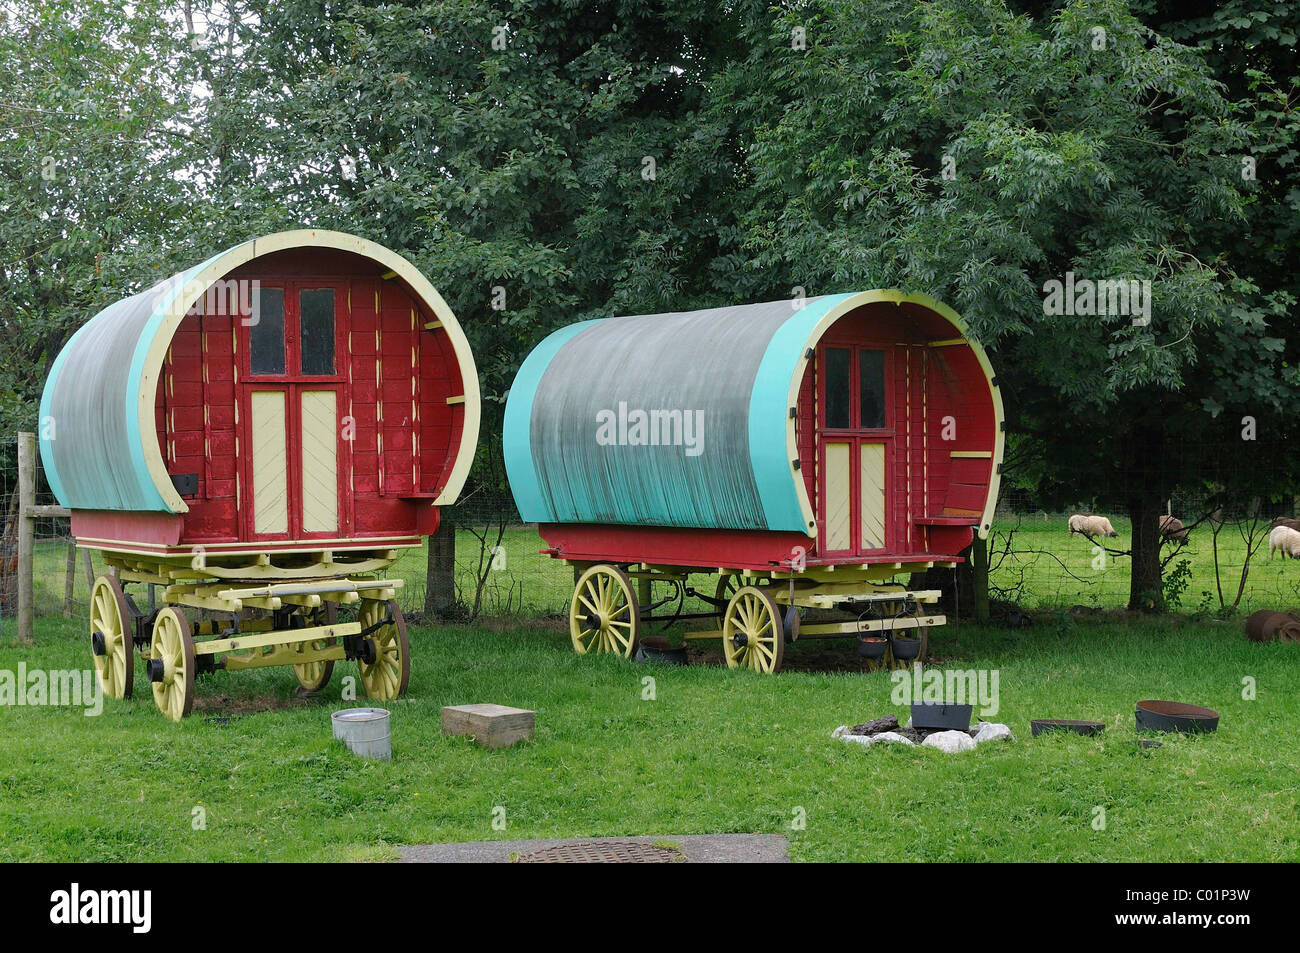 Wagons of the Traveller minority, Bunratty Folk Park, Ennis, Shannon Region, Ireland, Europe - Stock Image